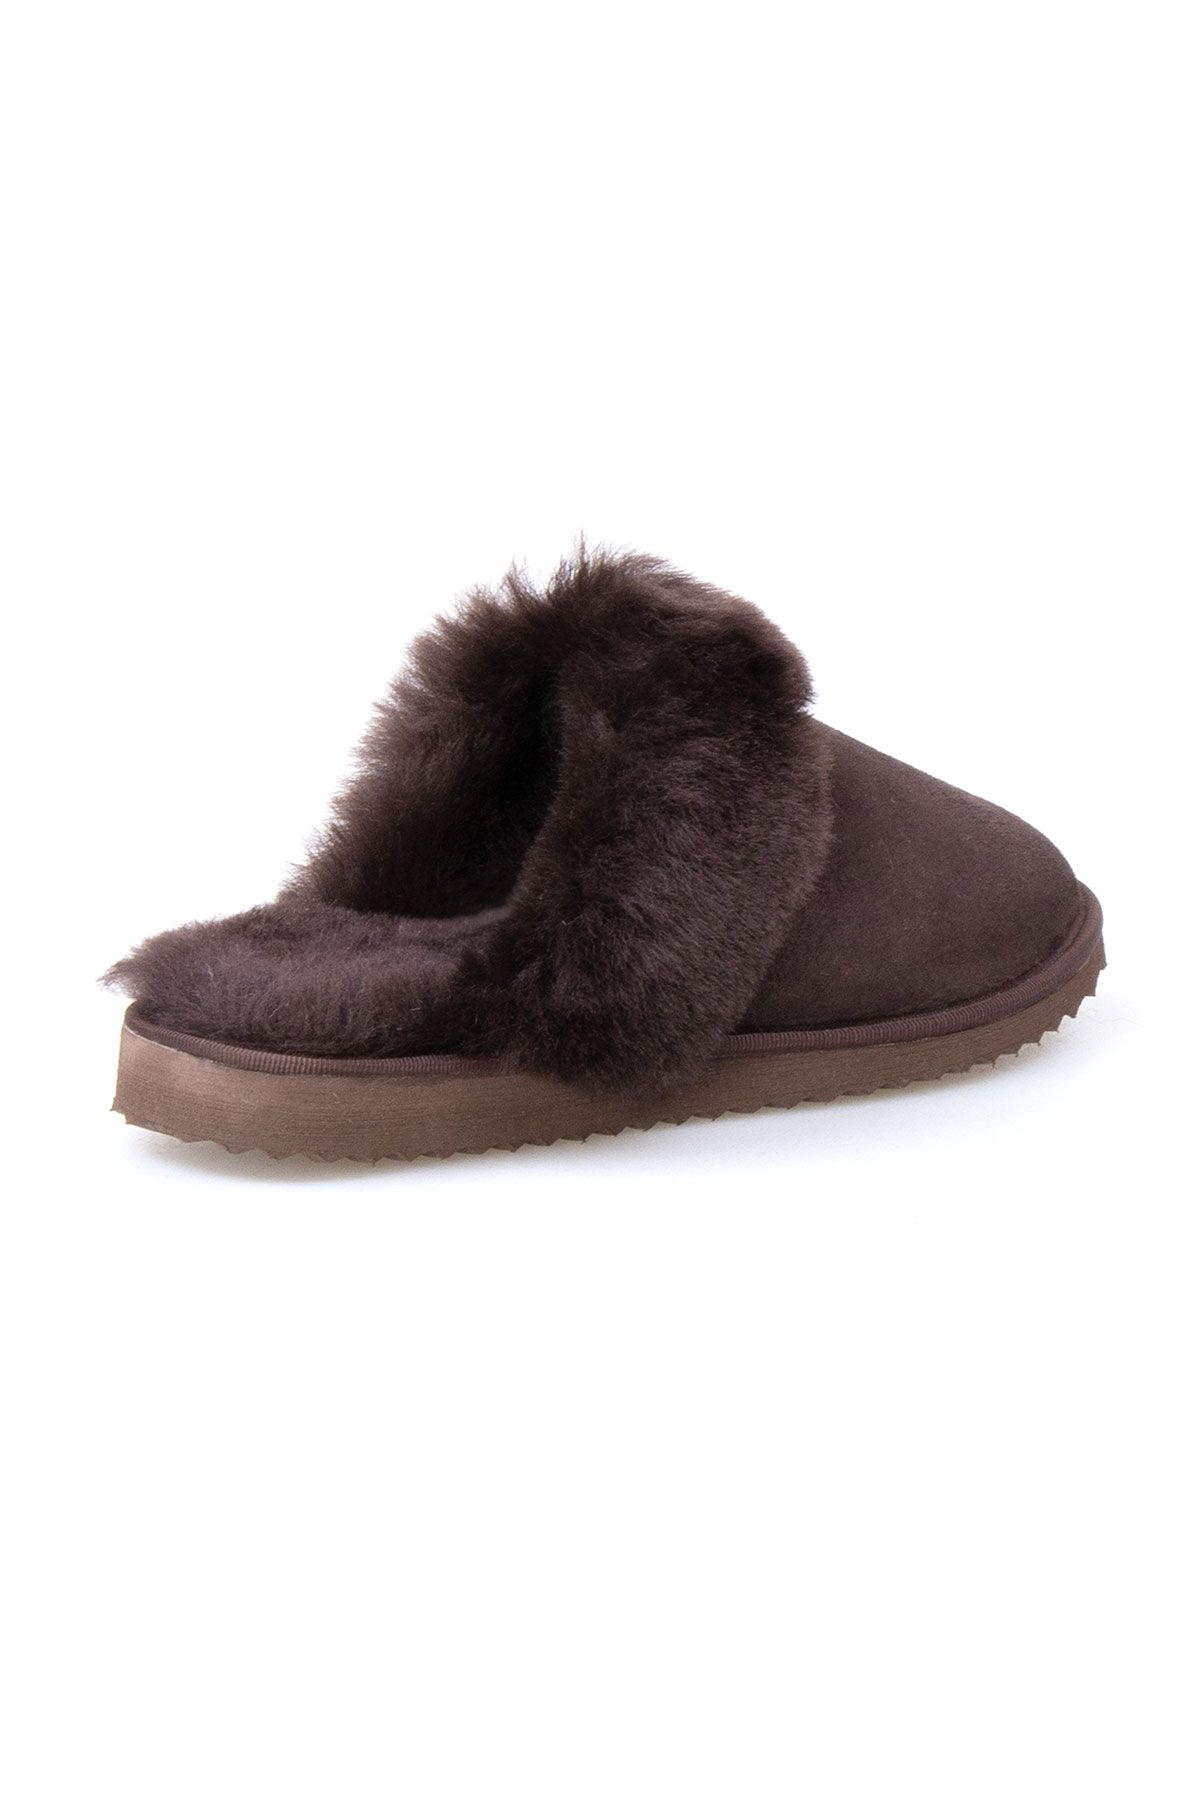 Pegia Genuine Sheepskin Women's Slippers 191105 Brown